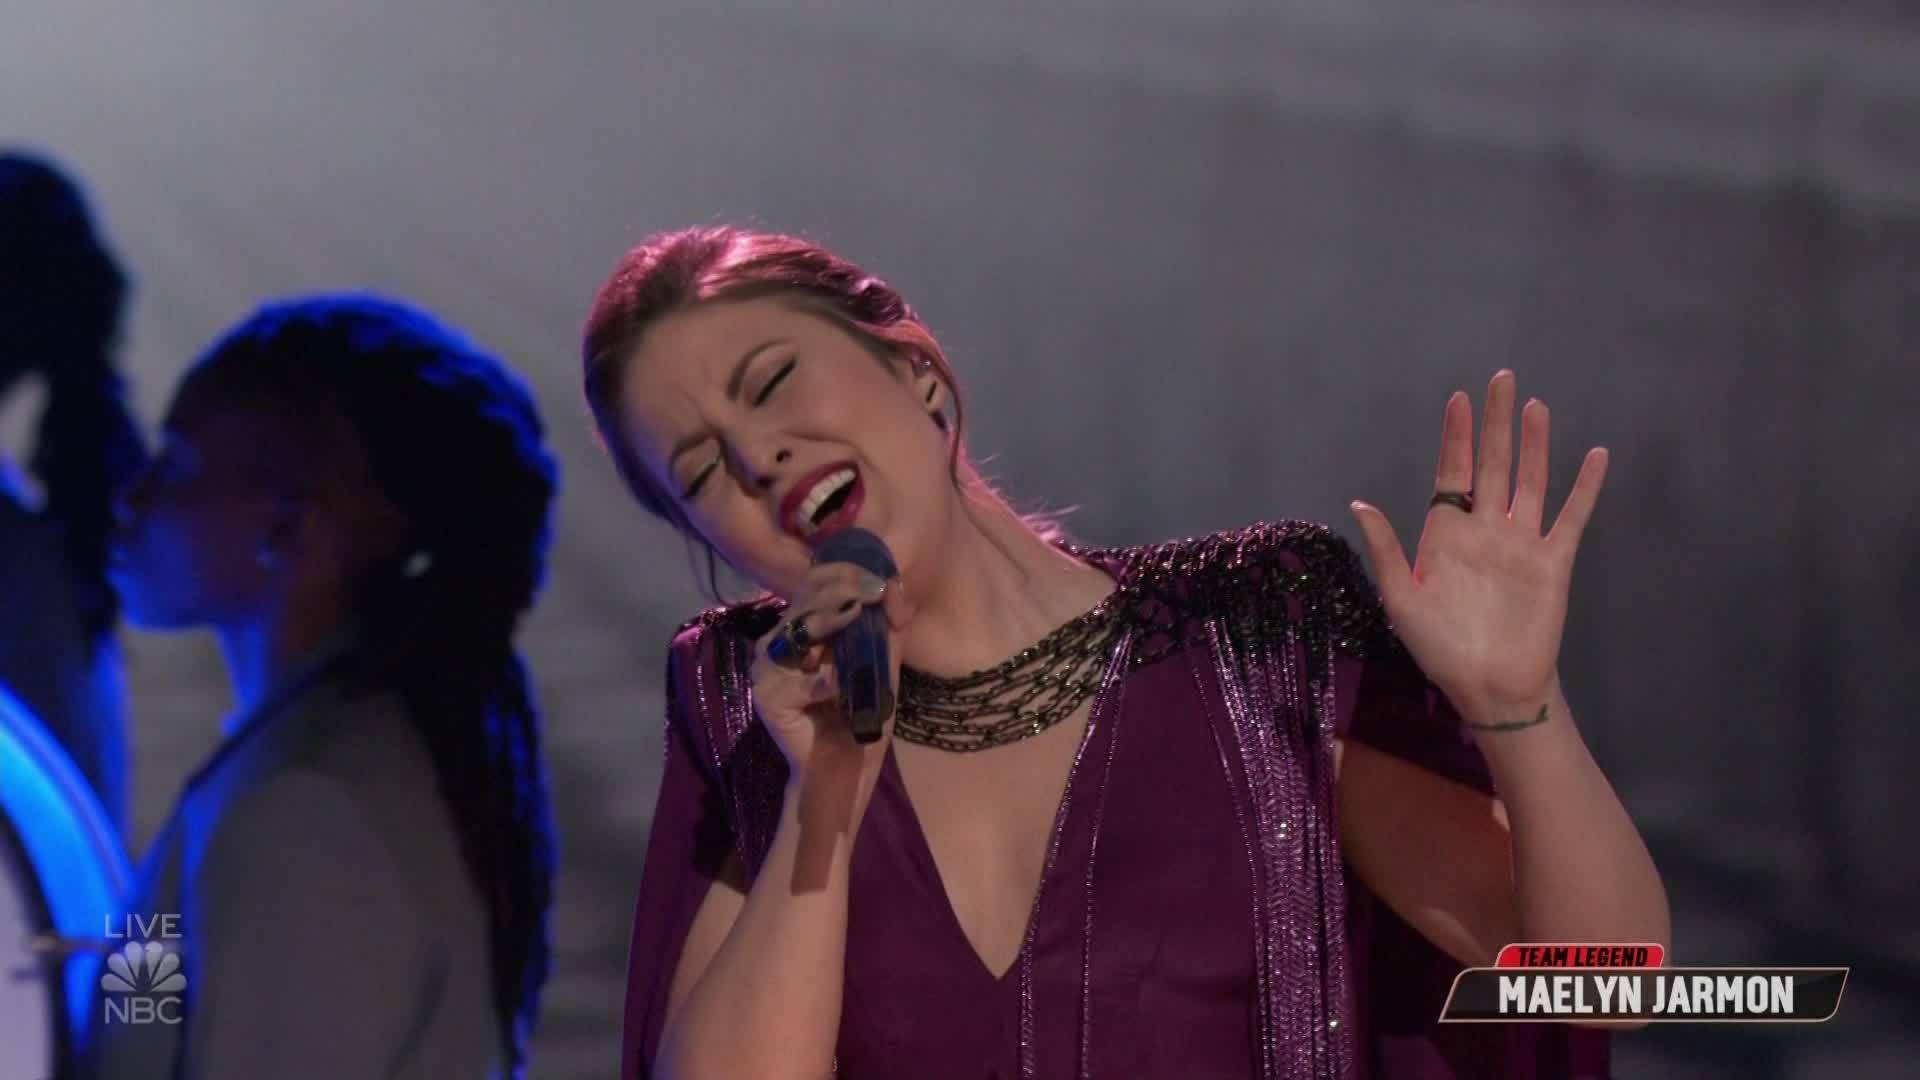 Team John Legend's Maelyn Jarmon wins 'The Voice'